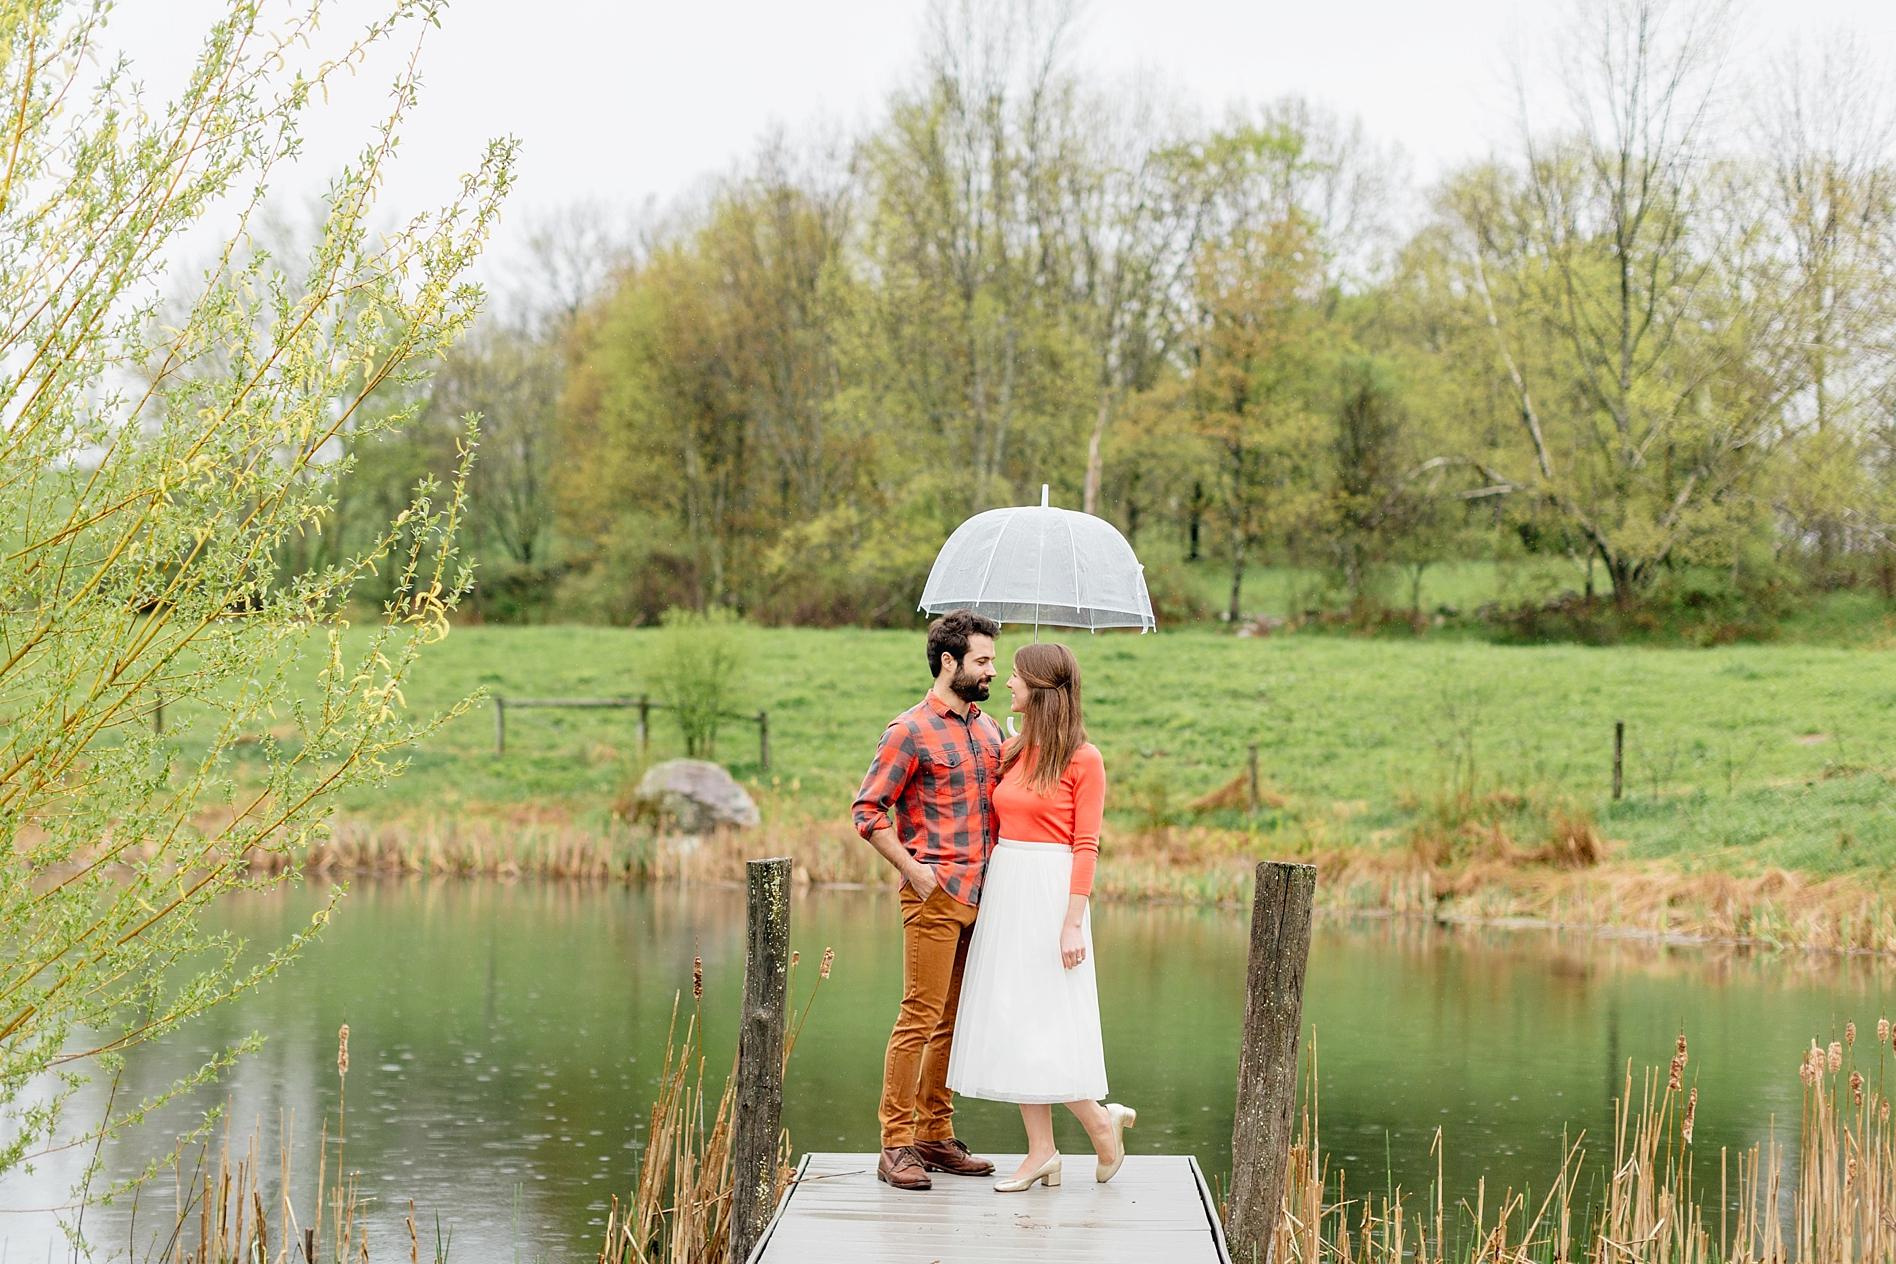 Rainy Day Engagement Session